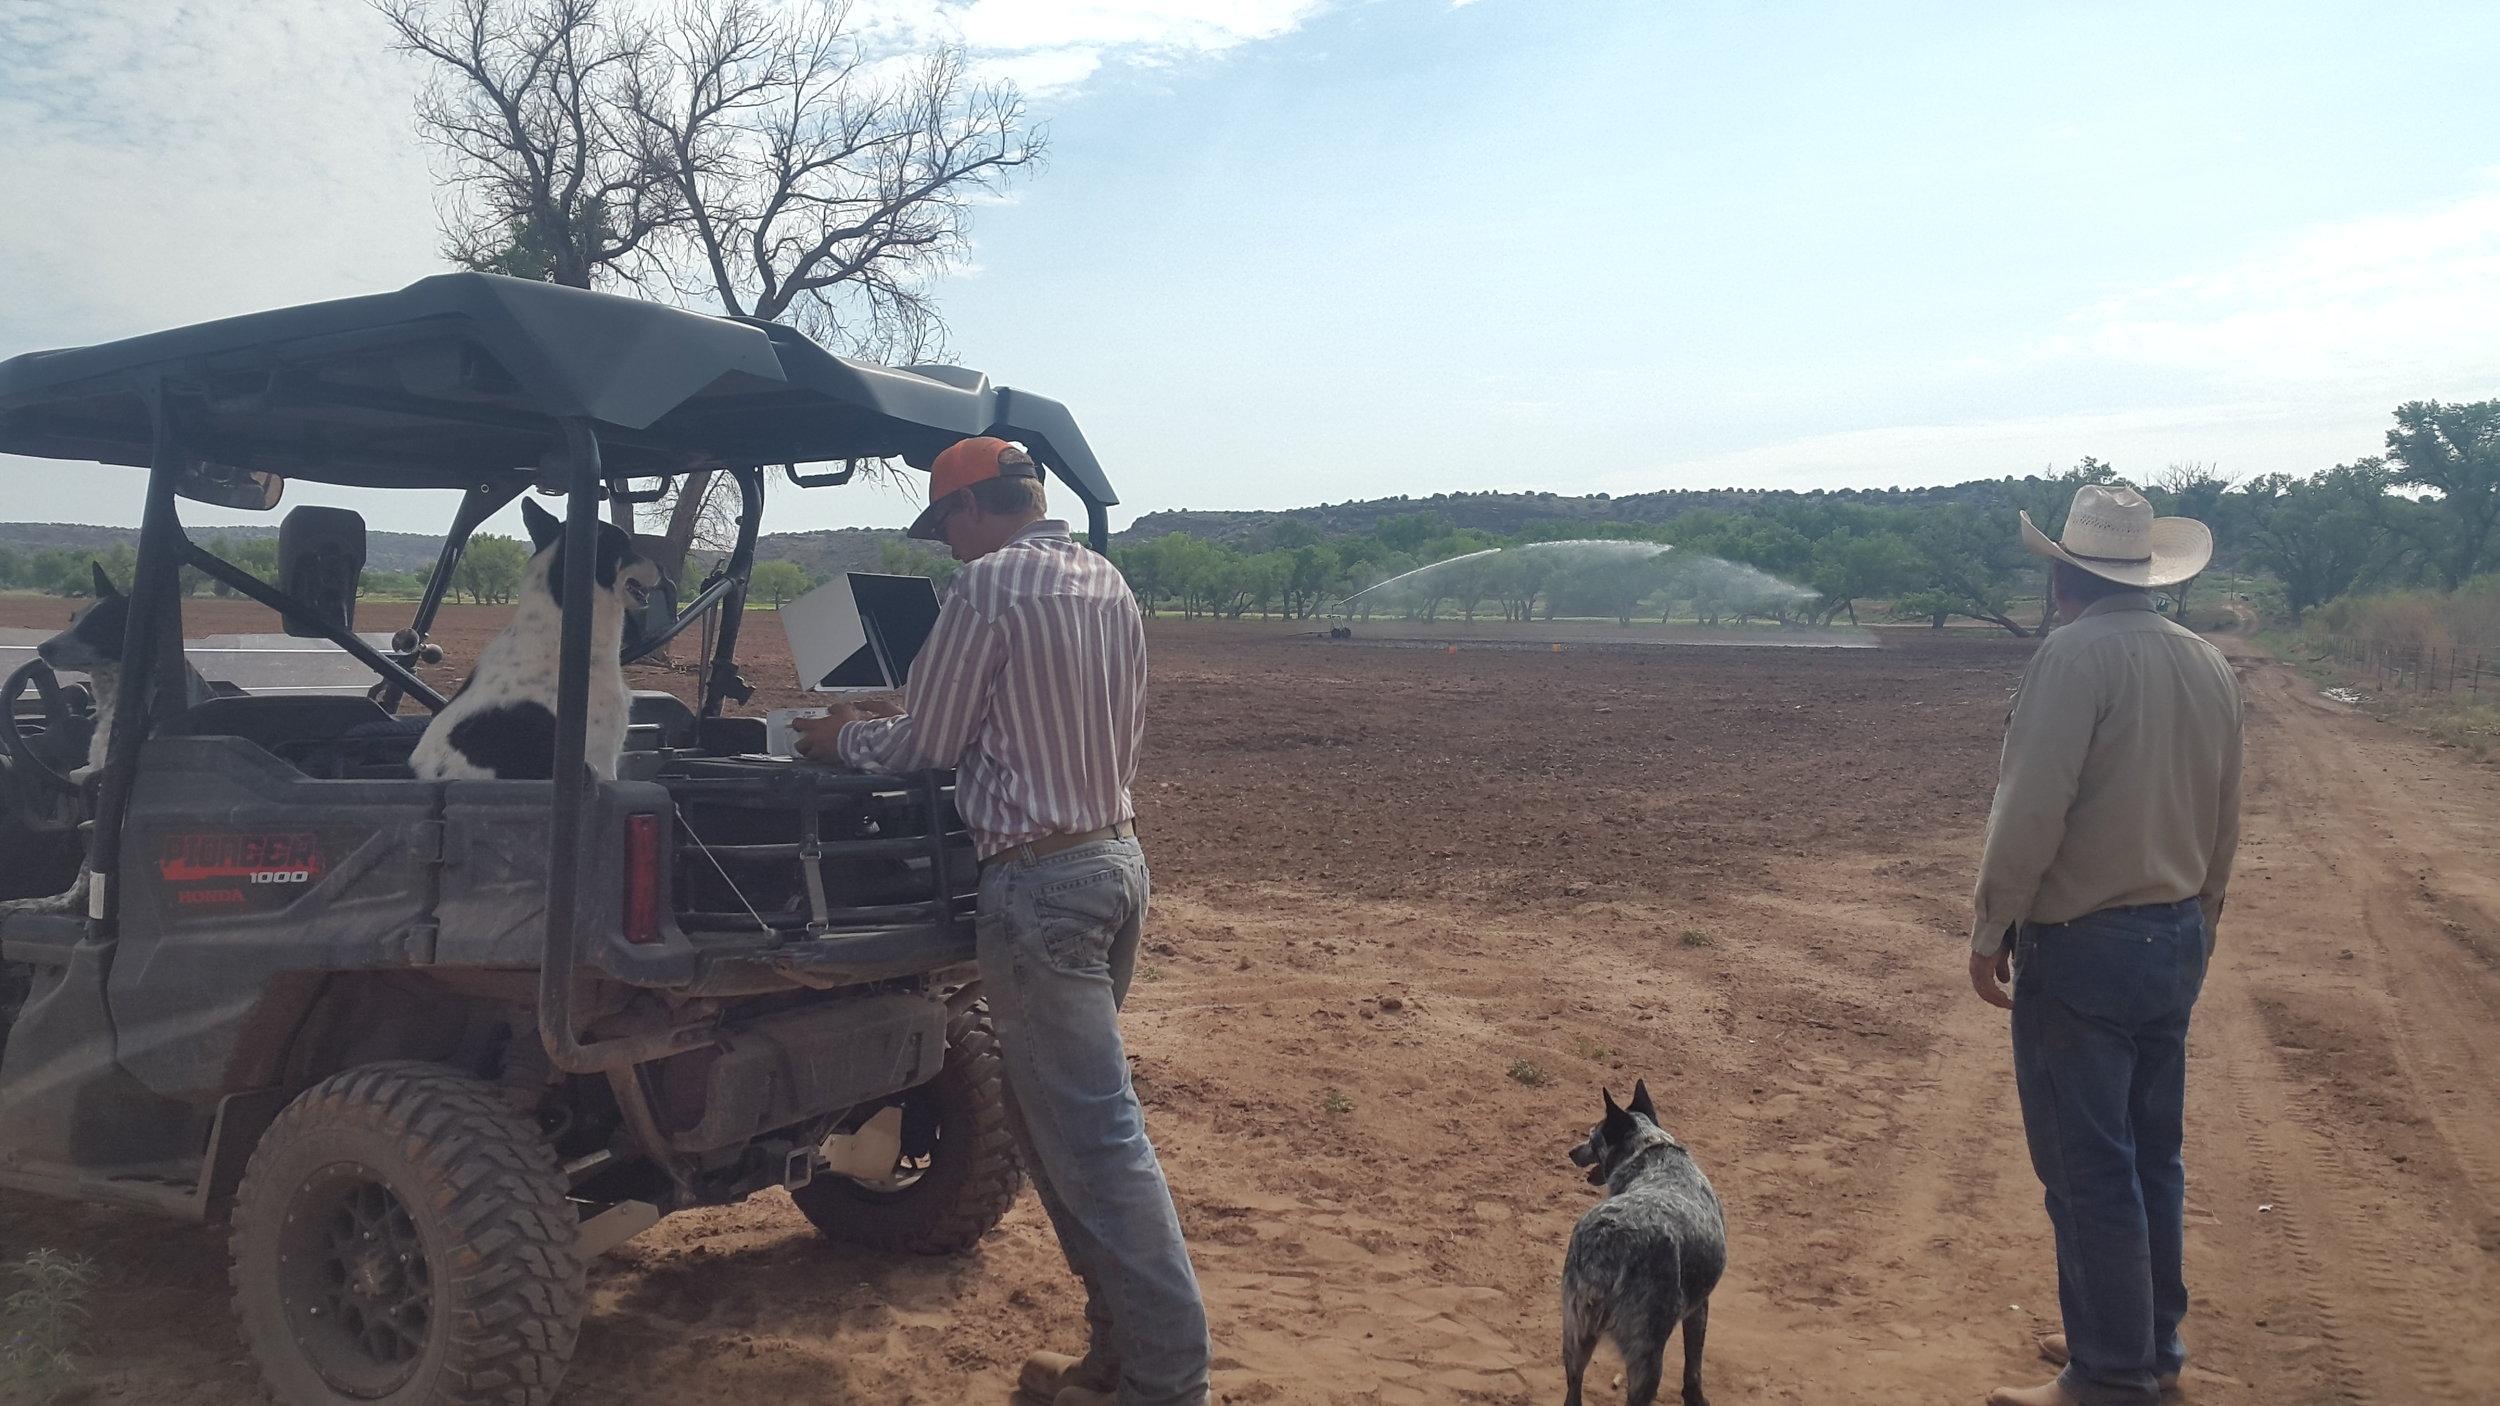 Apropos watering - Joe (right, Seth left) installed big water-sprinklers at the farm to water the fields.  Apropos Wässern - Joe (rechts, Seth links) hat grosse Sprenkler auf den Feldern der Farm installiert.